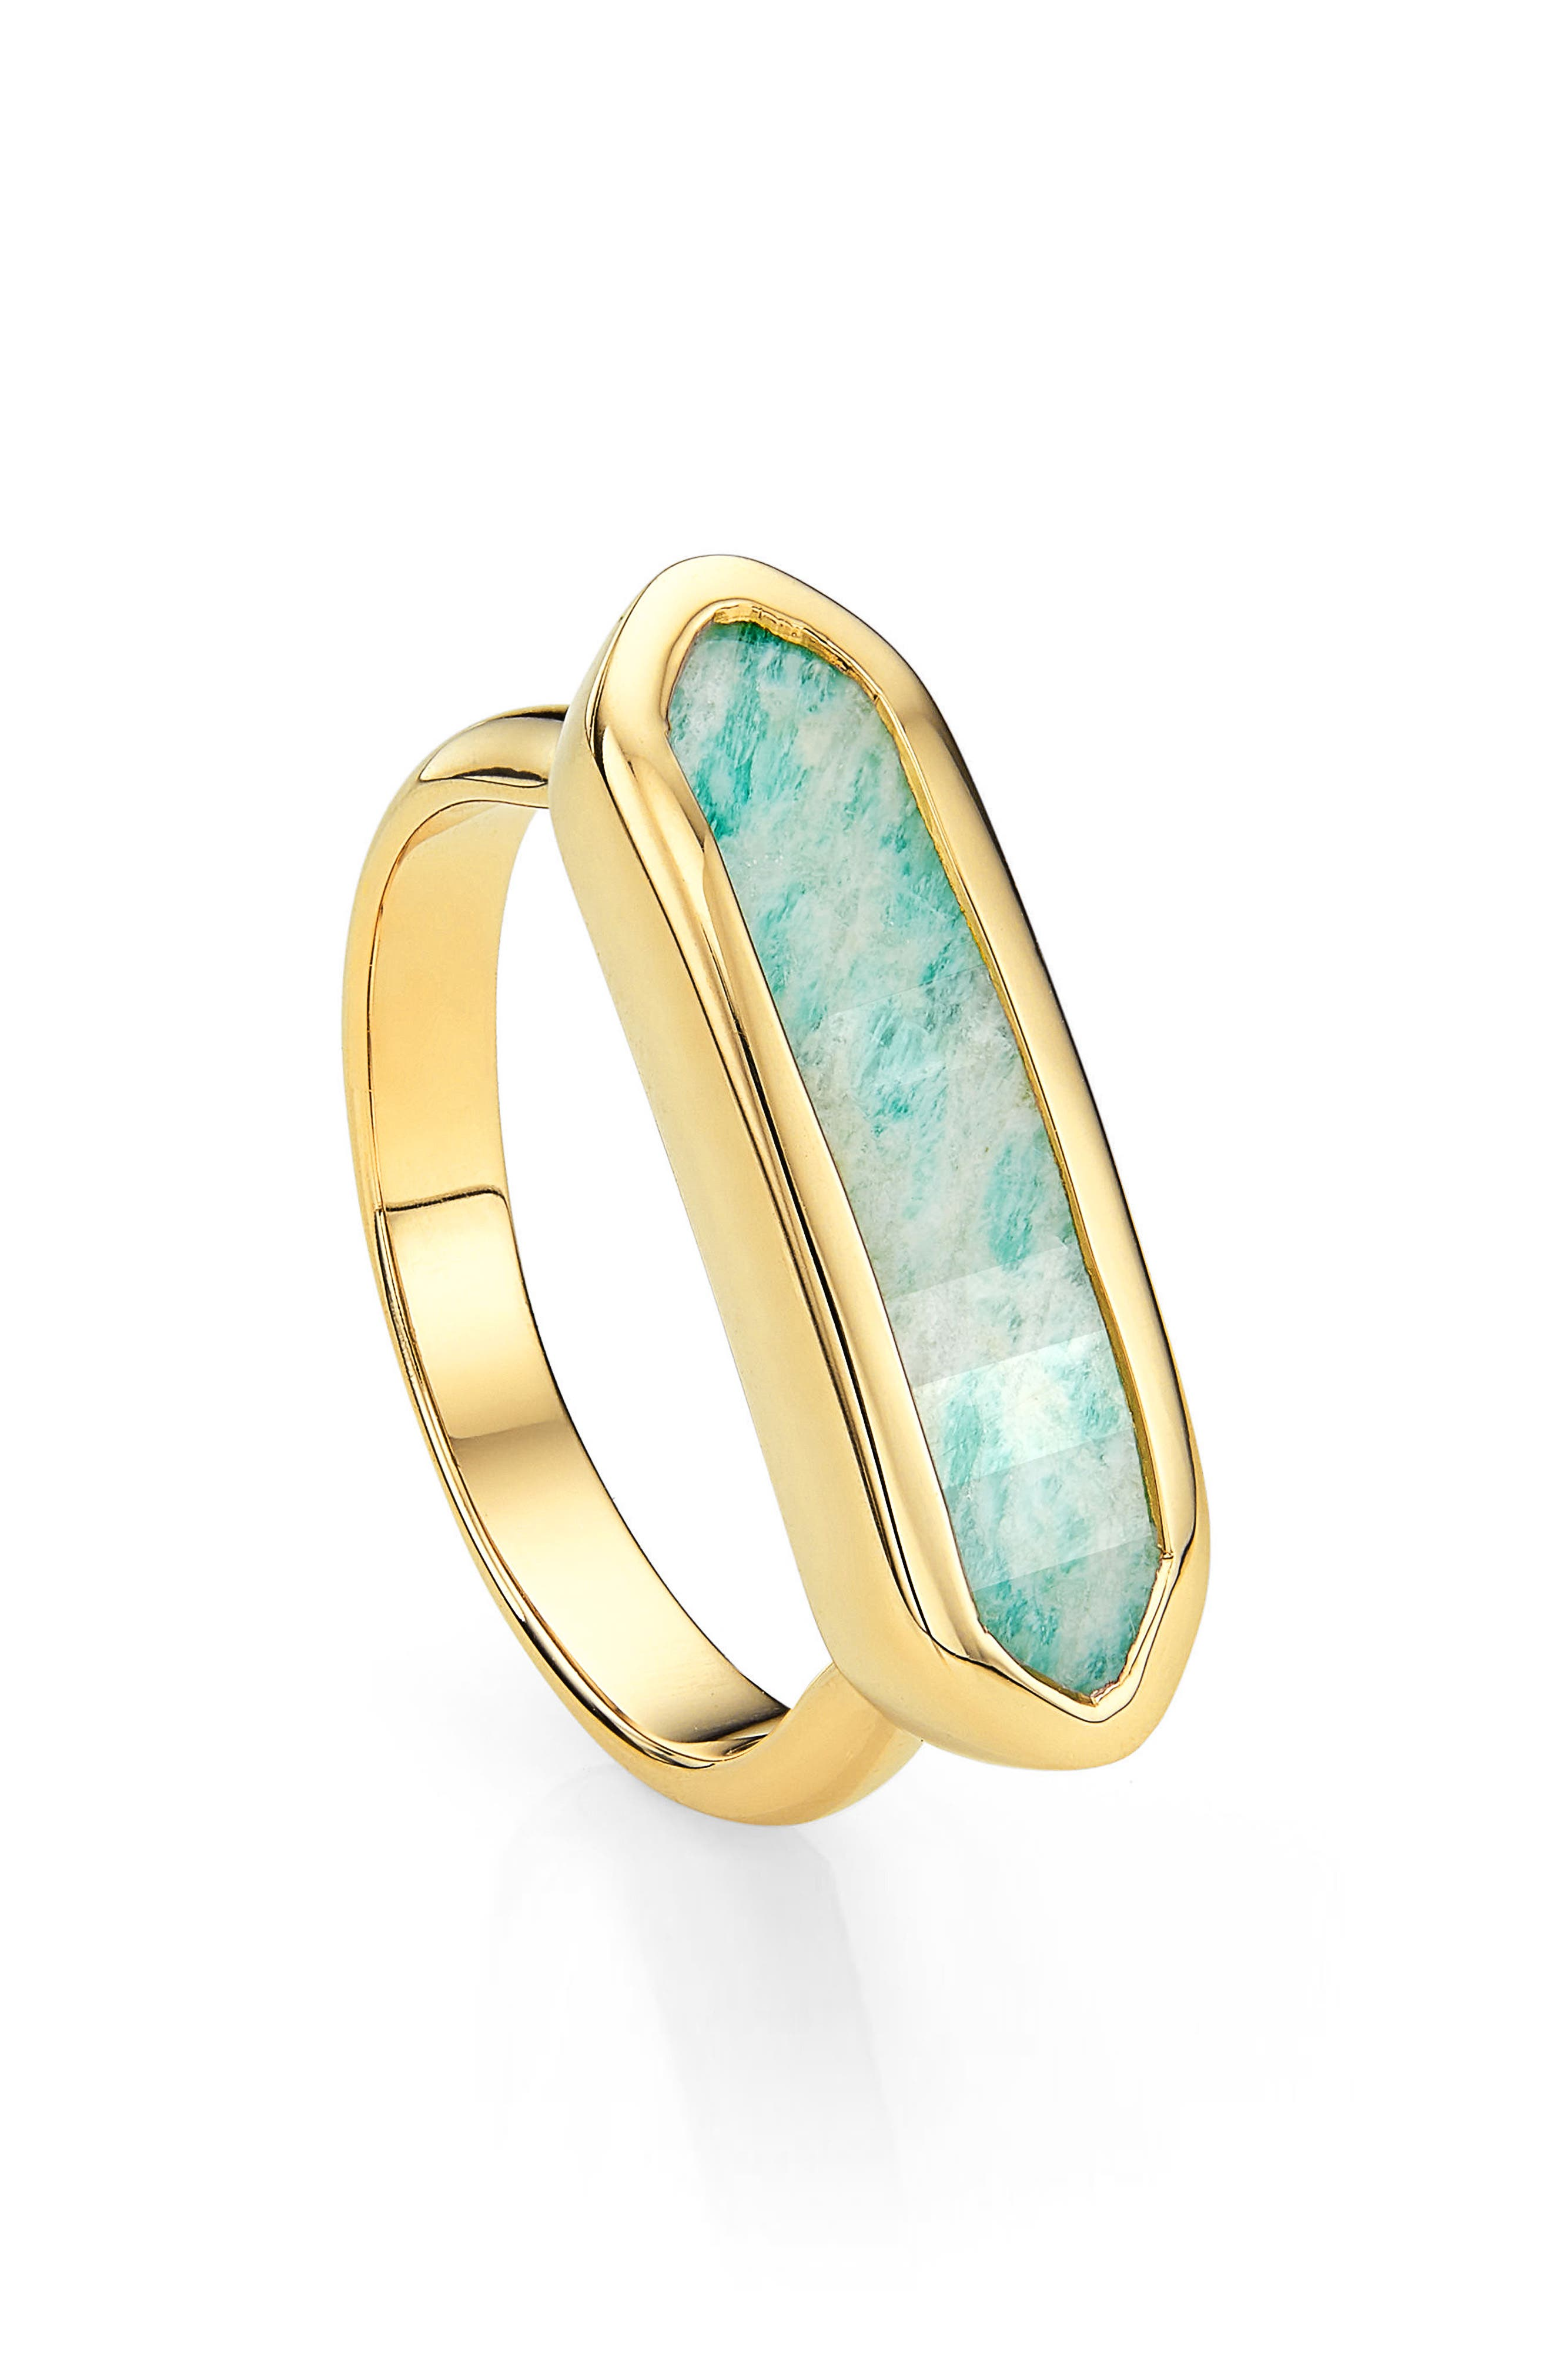 Monica Vinader 'Baja' Stone Ring